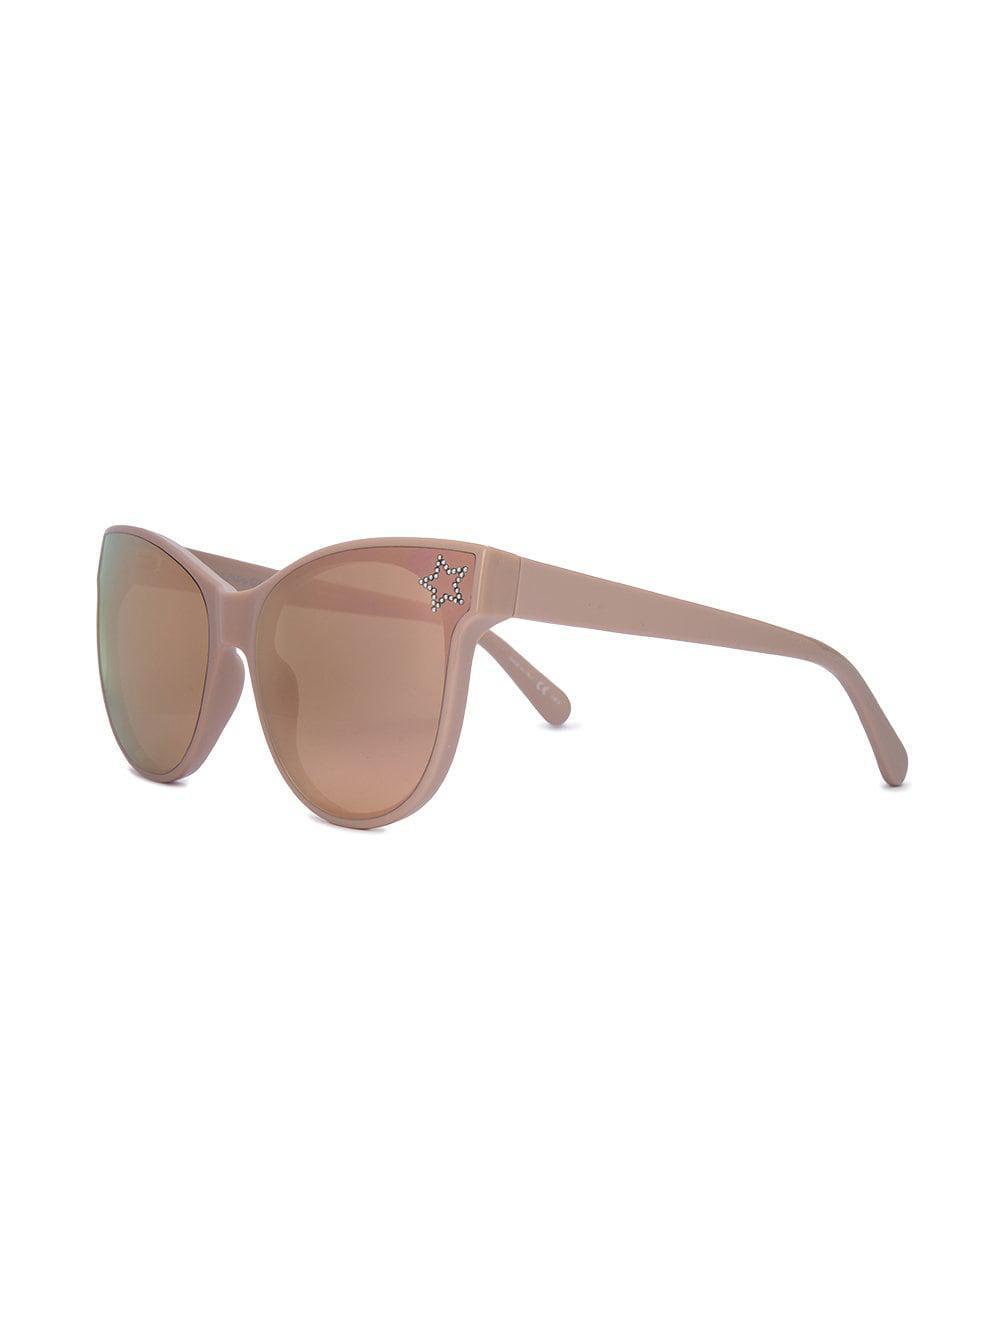 2523a46fe415 Stella McCartney Pink Star Embellished Cat Eye Sunglasses in Pink - Lyst